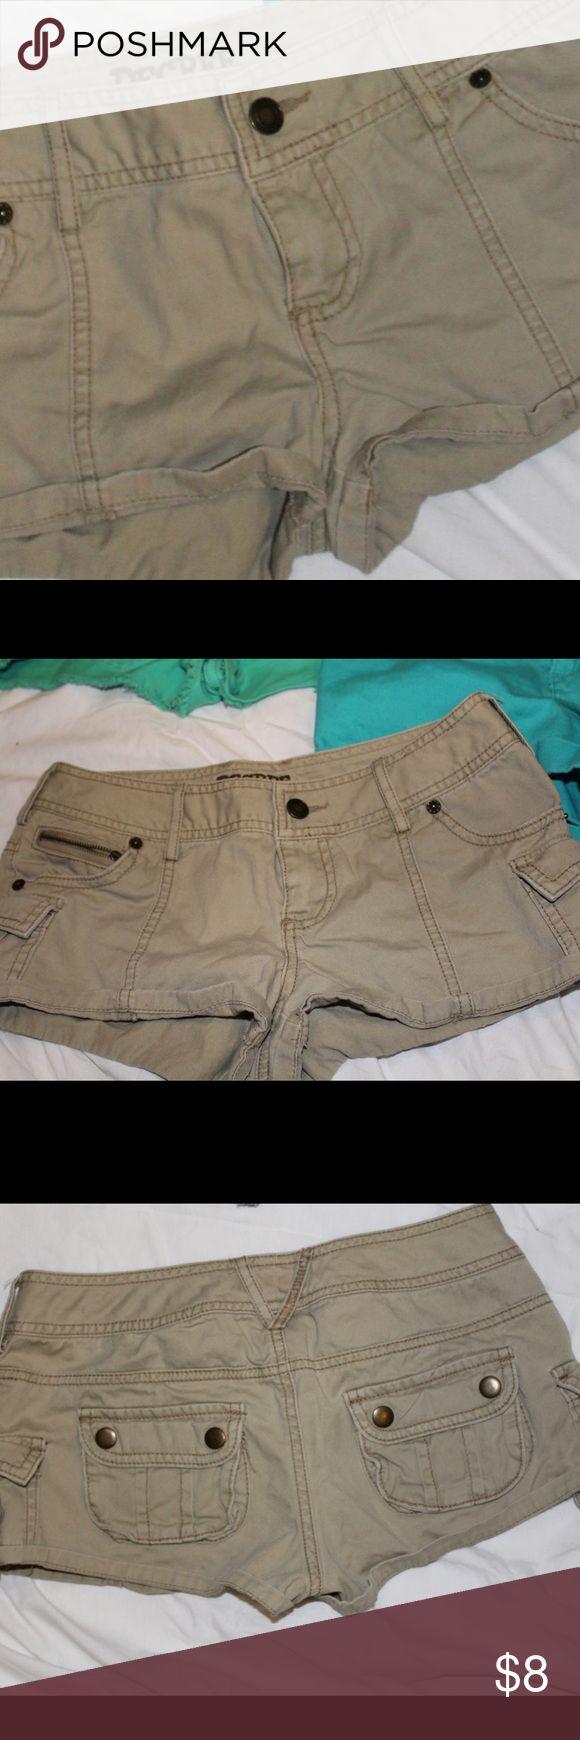 Khaki Military Shorts Khaki military inspired shorts in a size 3/ 26. Decree Shorts Jean Shorts